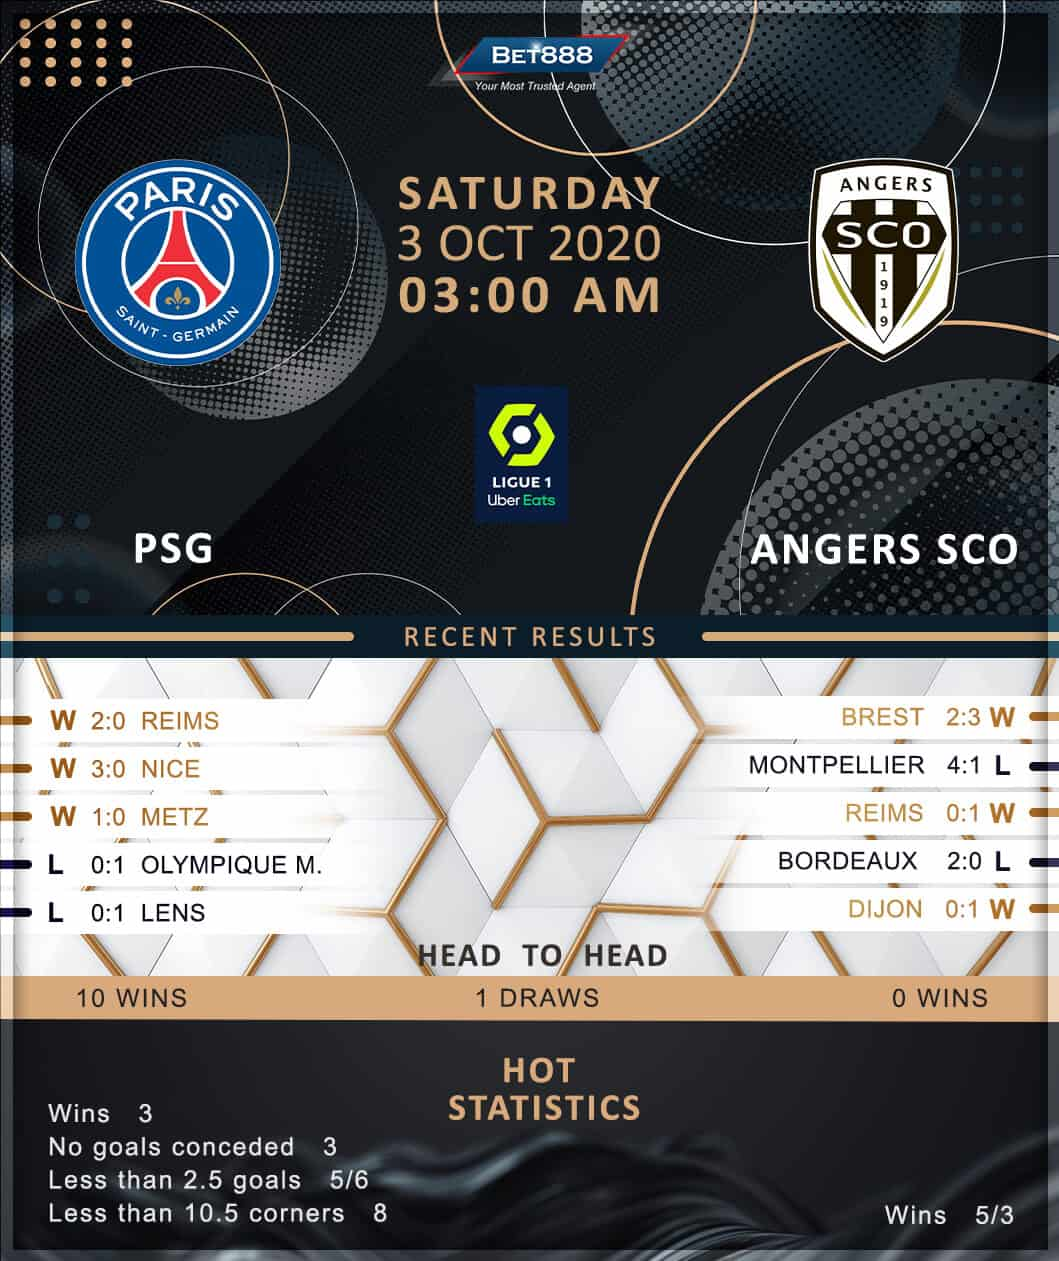 PSG vs Angers 03/10/20